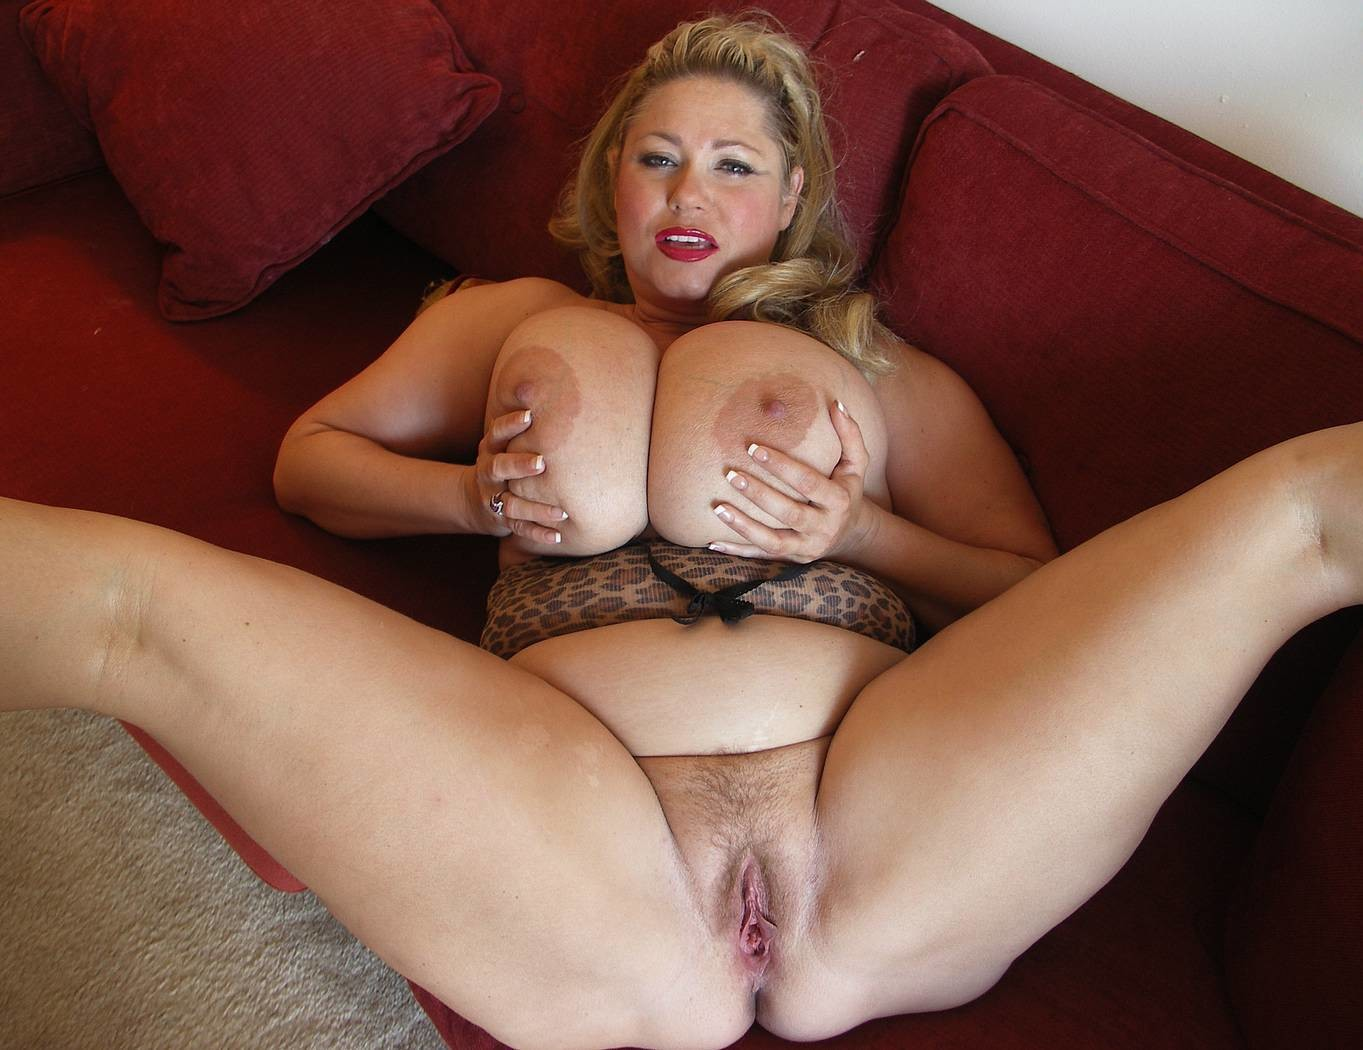 samie-ogromnie-siski-v-mire-porno-teti